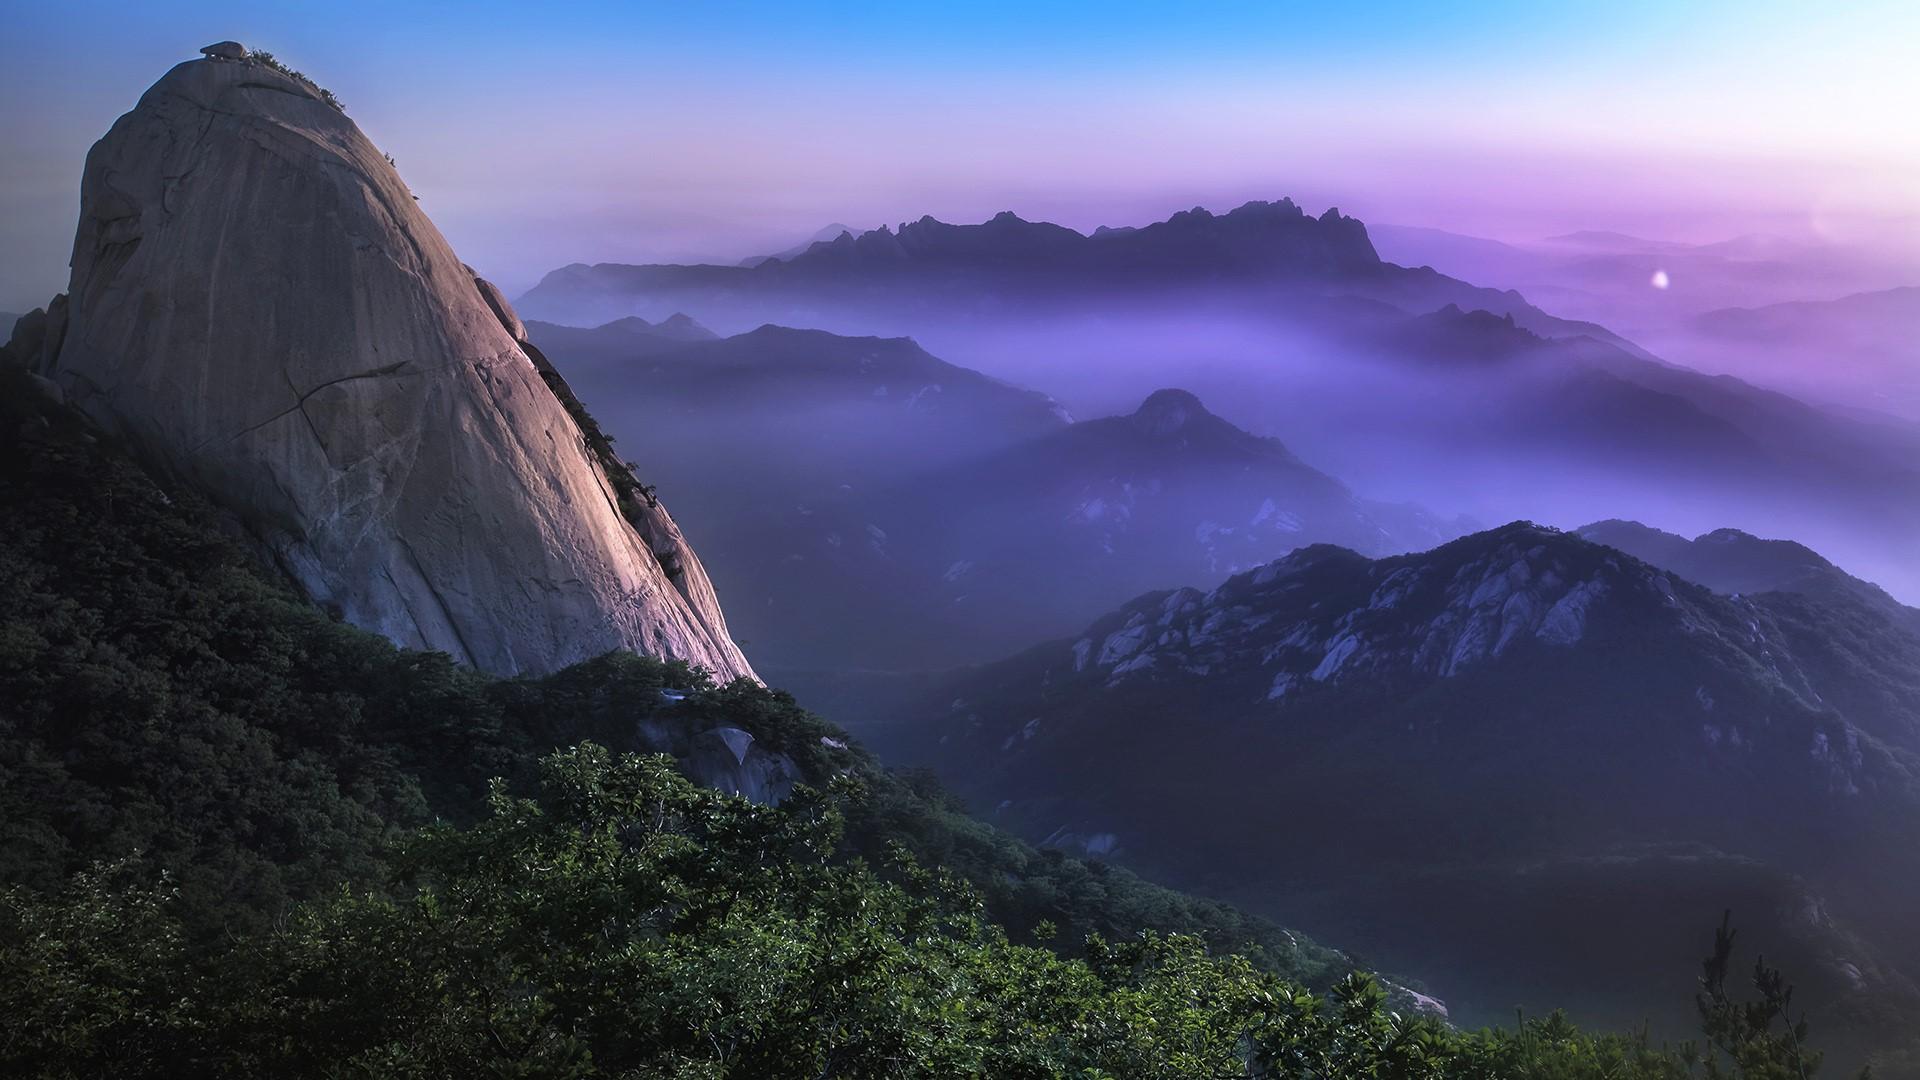 General 1920x1080 nature landscape trees forest mist rock sky Seoul South Korea